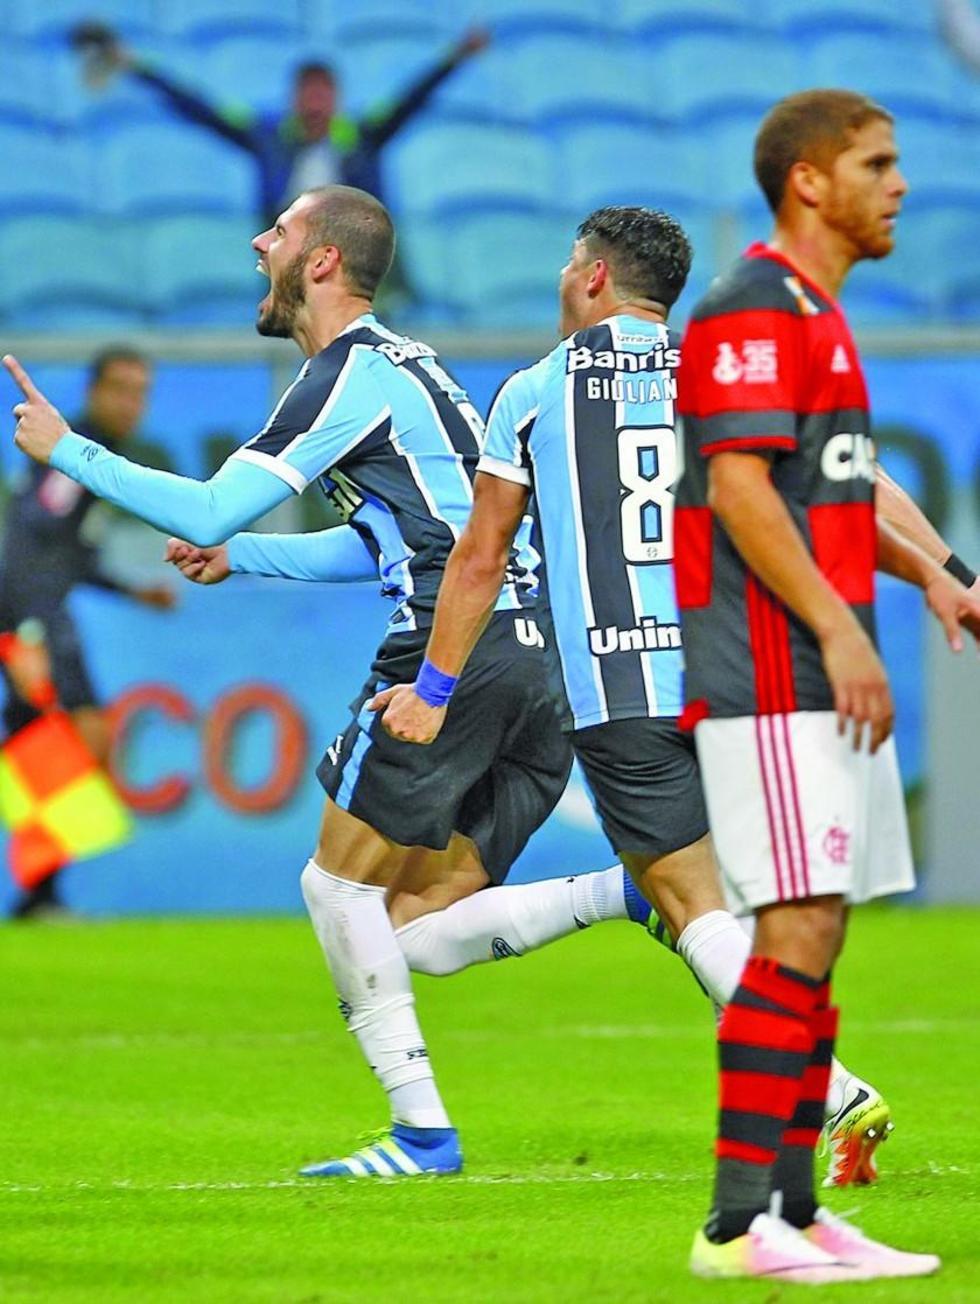 Gremio derrota 2-0 a Flamengo en la liga brasileña